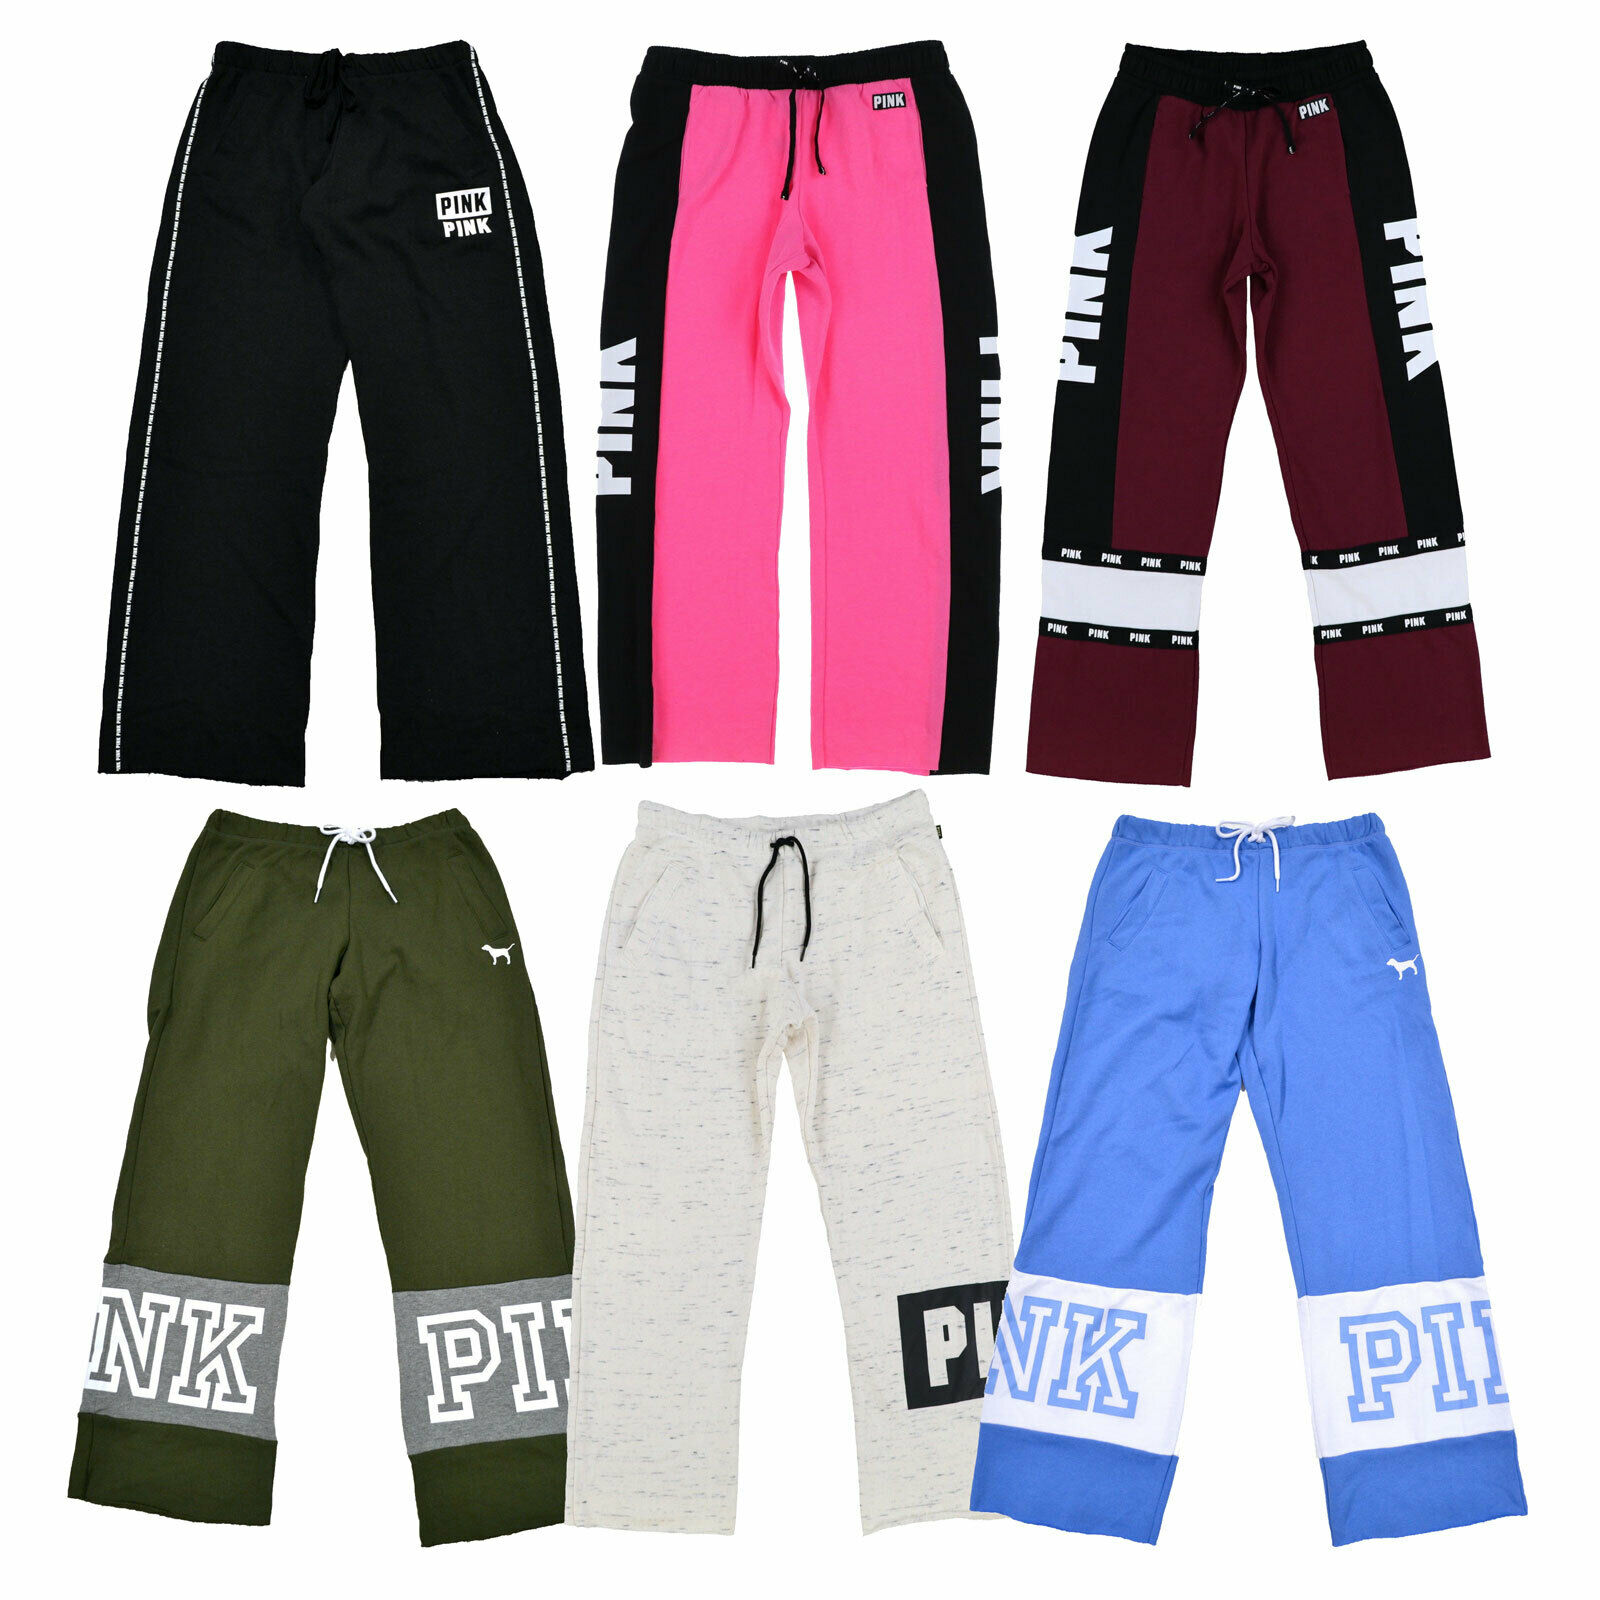 NWT $49 ATHLETA Sunlover UPF Tank Flint Gray Fitness Lifestyle Yoga Gym XS S M L